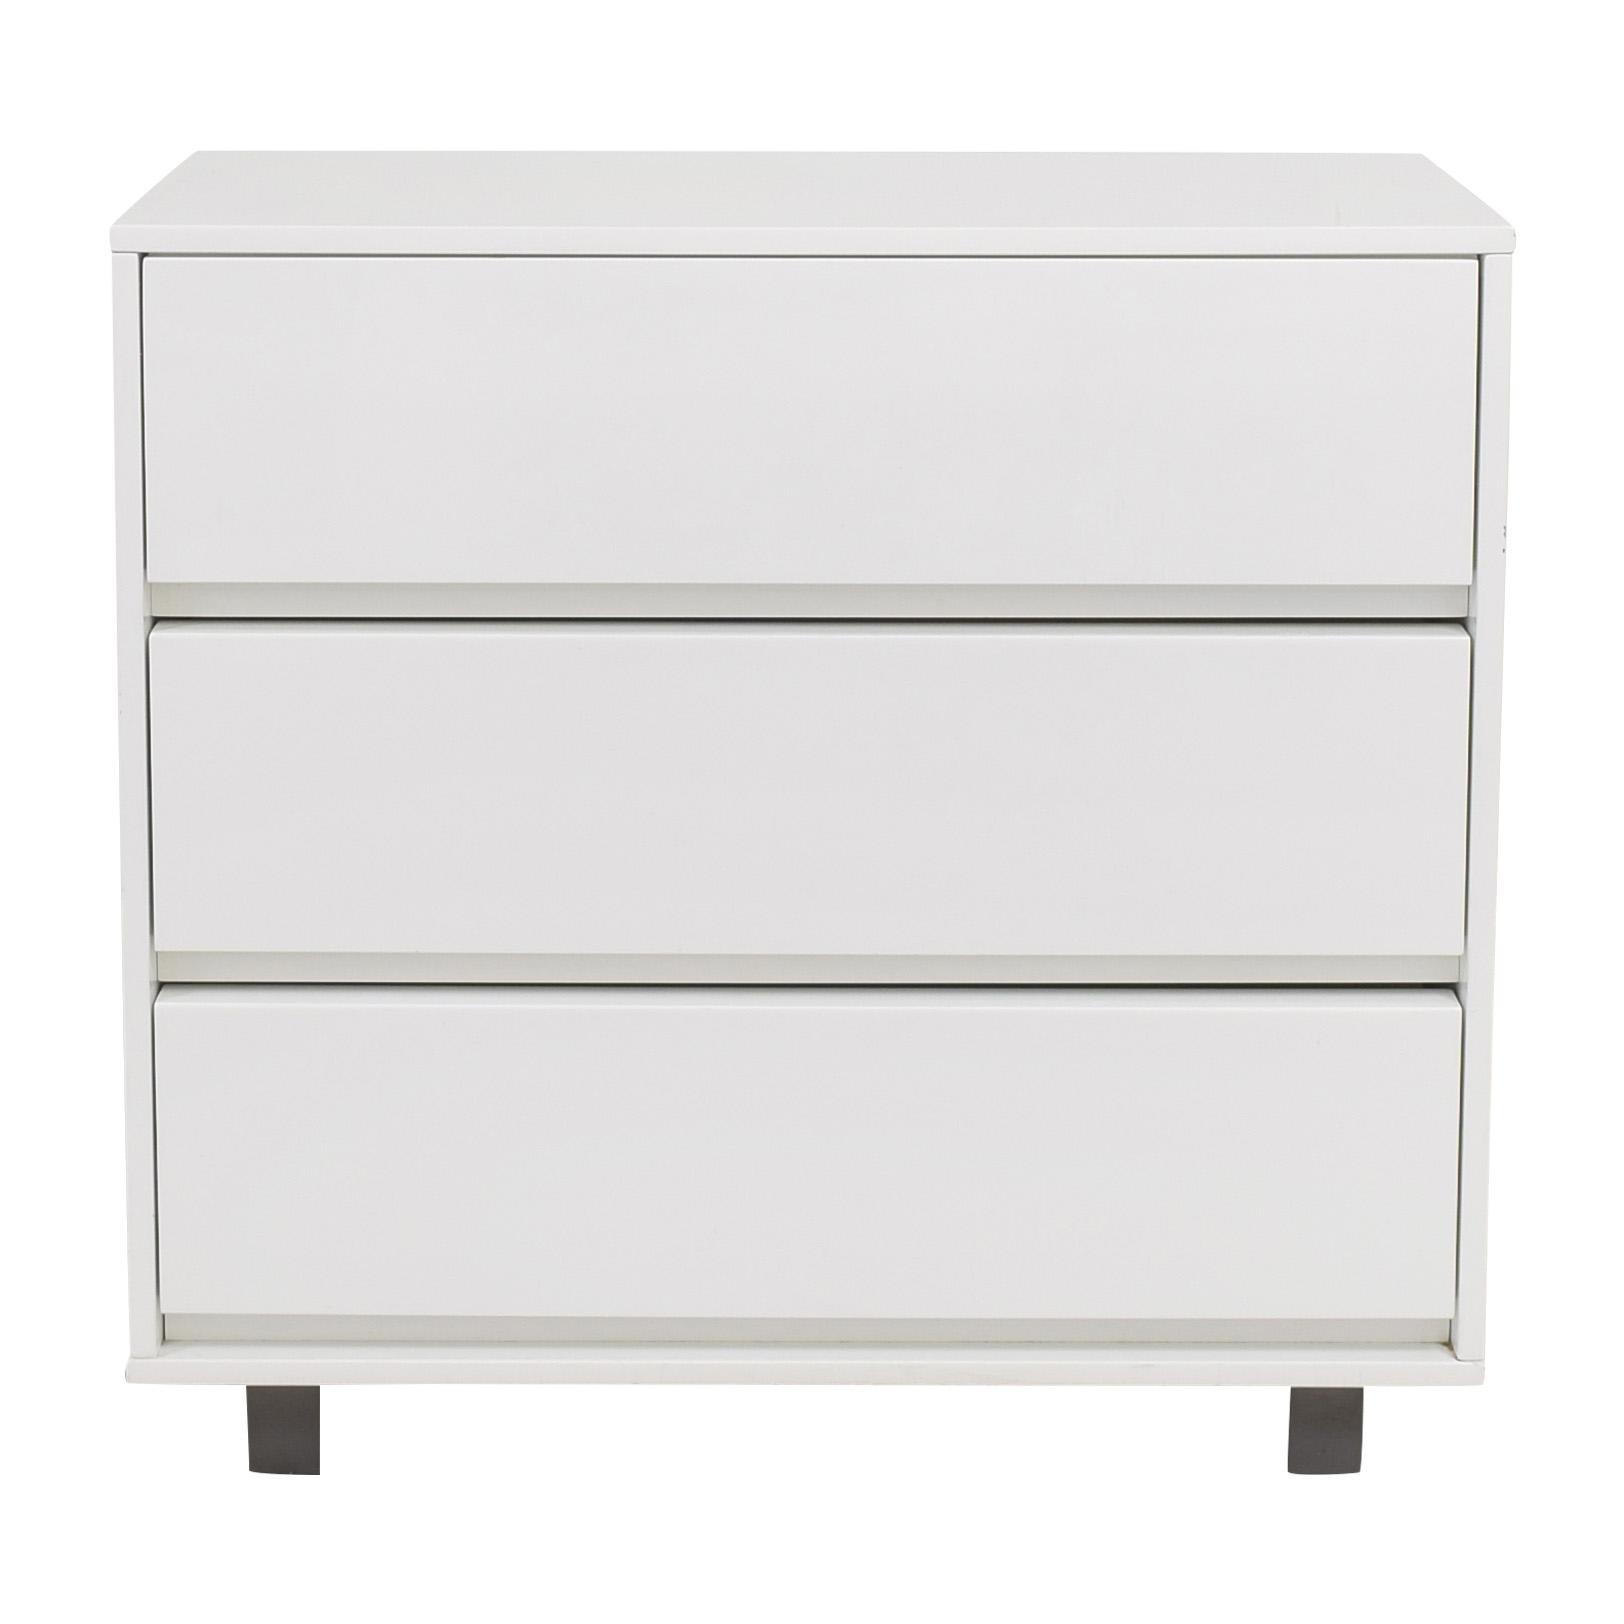 buy CB2 Gallery Three Drawer Chest CB2 Storage